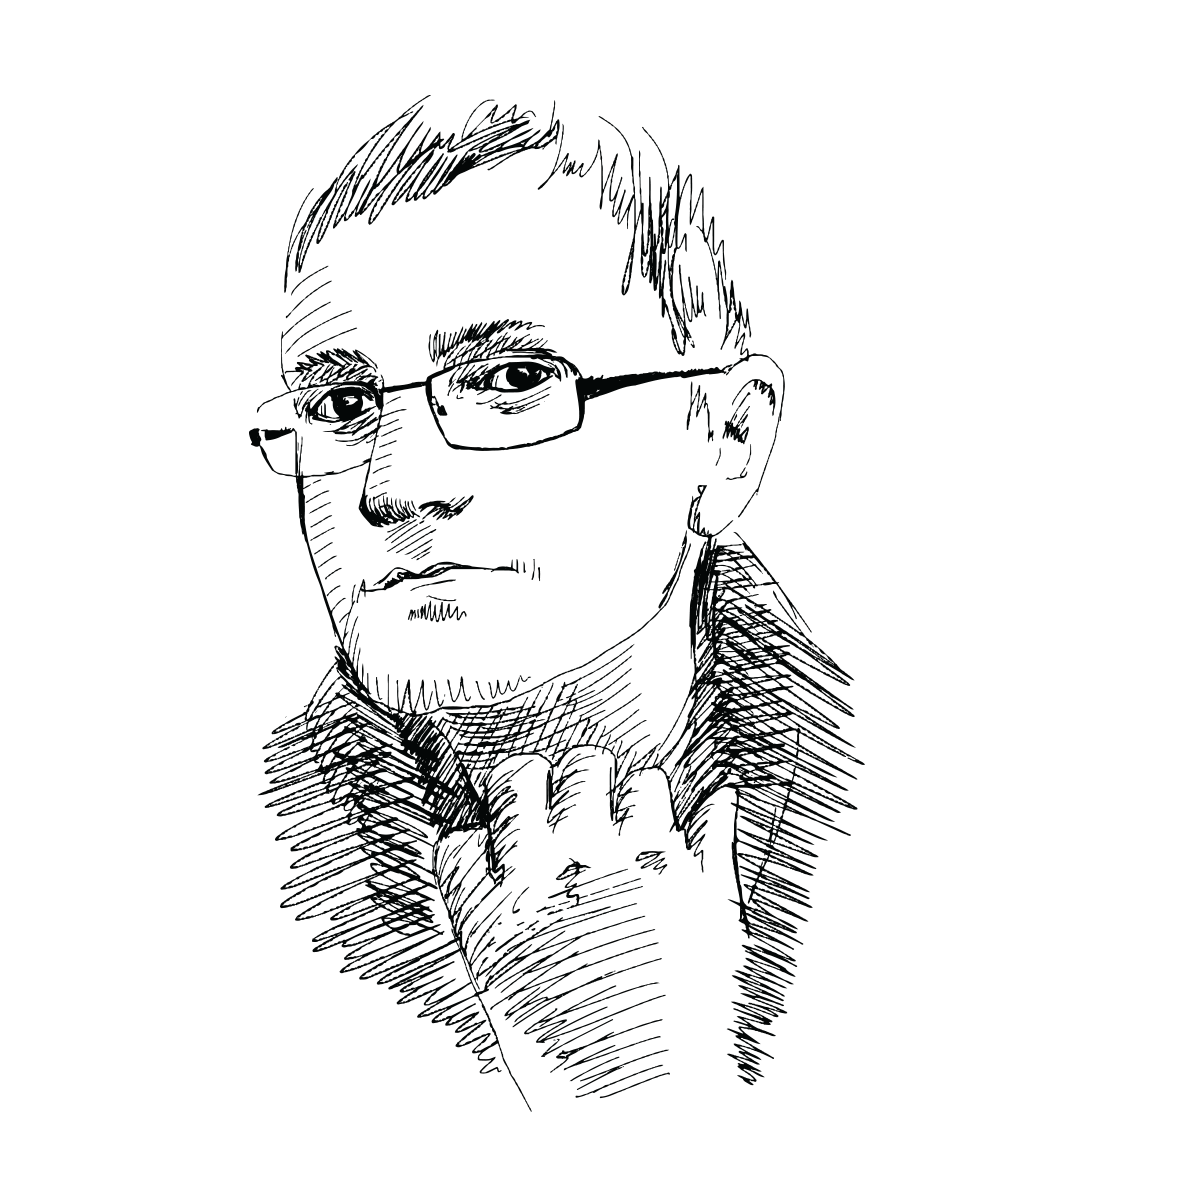 https://www.satinagarden.ro/wp-content/uploads/2017/05/minimalist-image-team-member-03-large.png